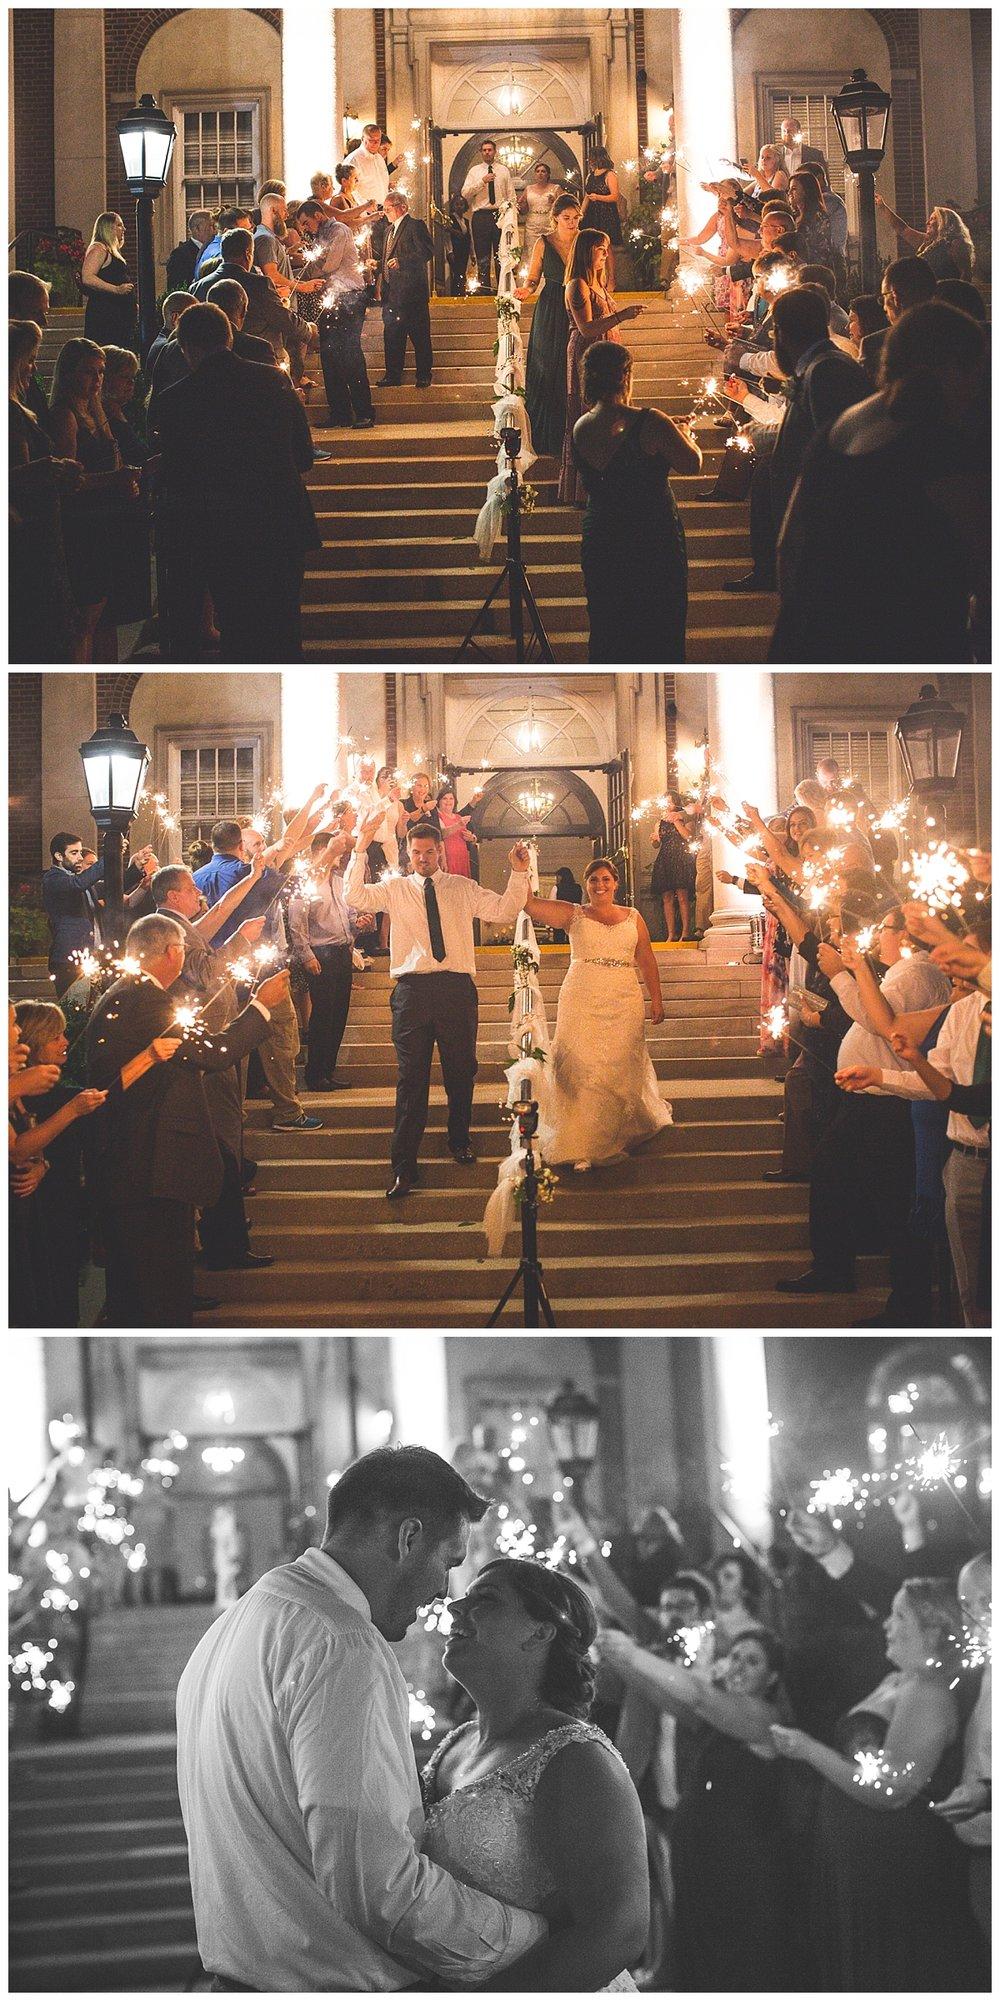 20180902-BridgetAdam-Wedding-blog-60.jpg